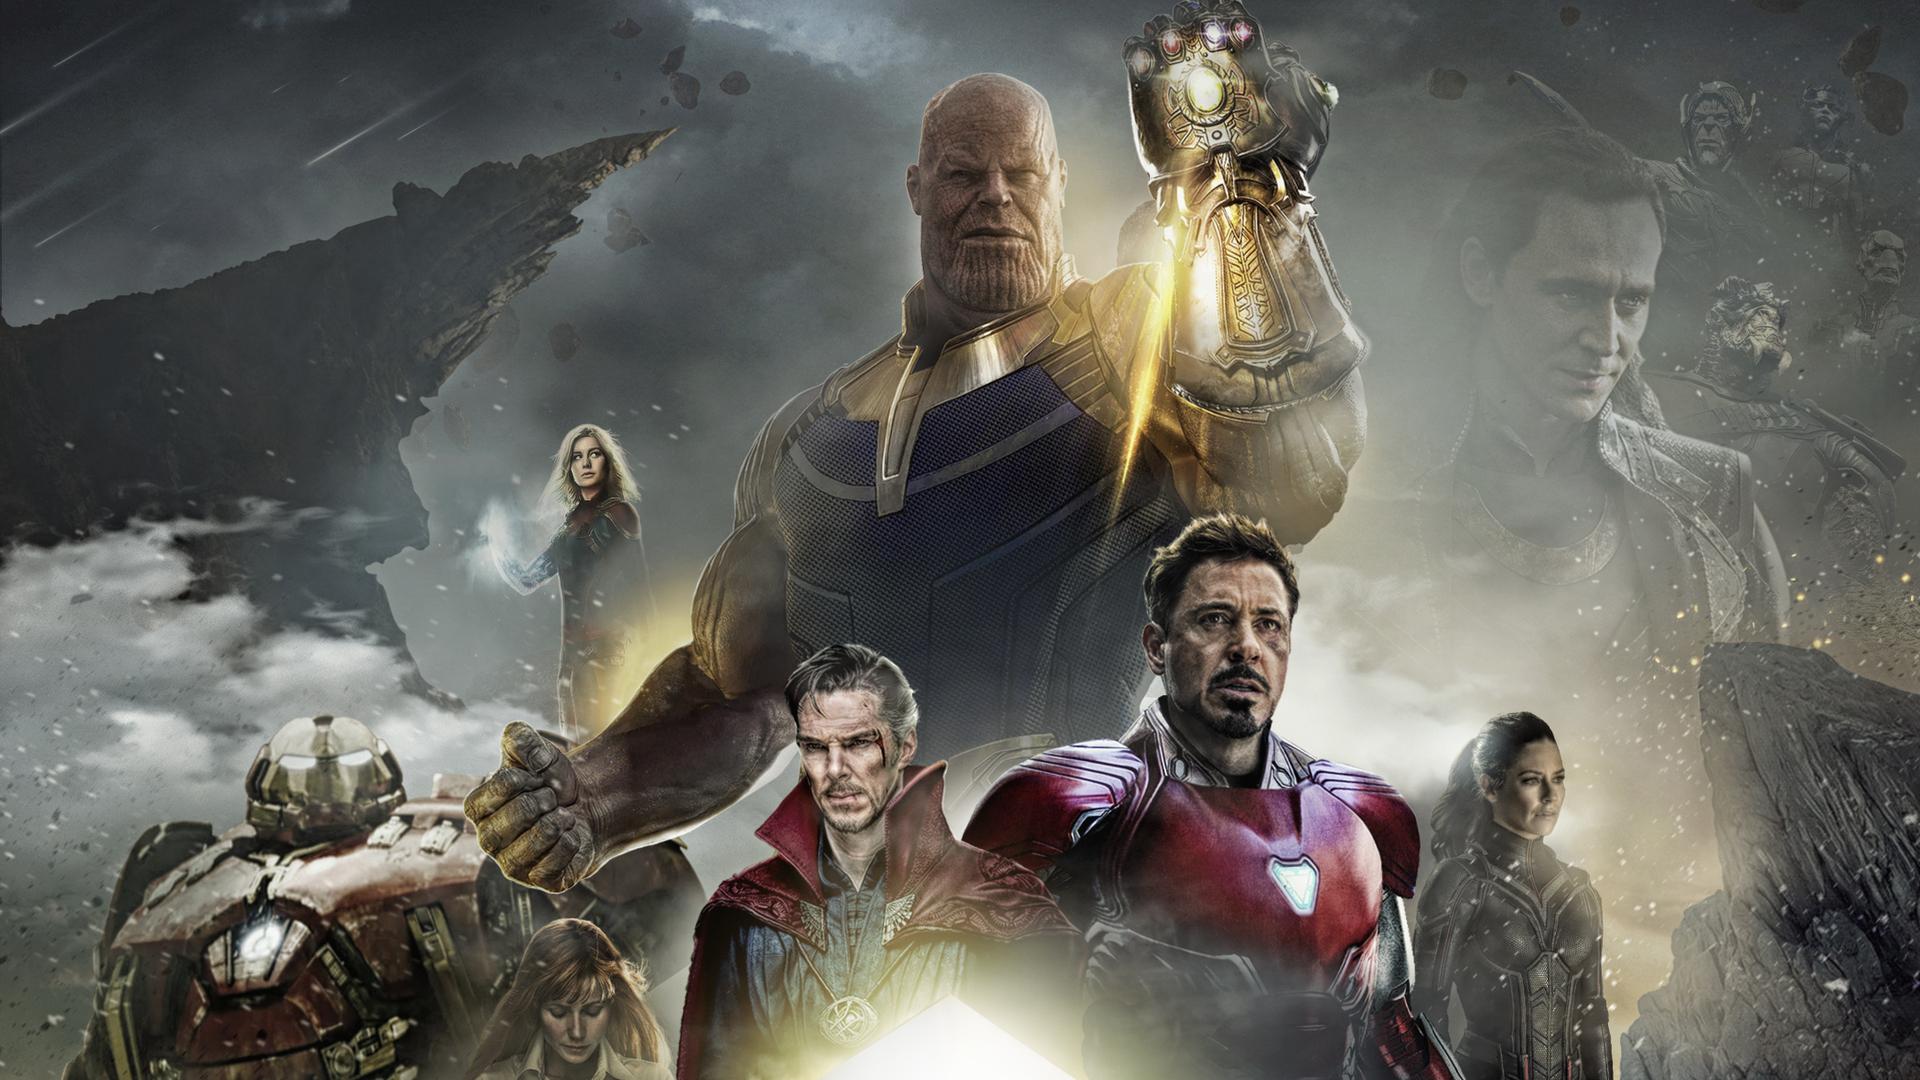 1920x1080 Avengers Infinity War 2018 Poster Fan Made Laptop Full Hd